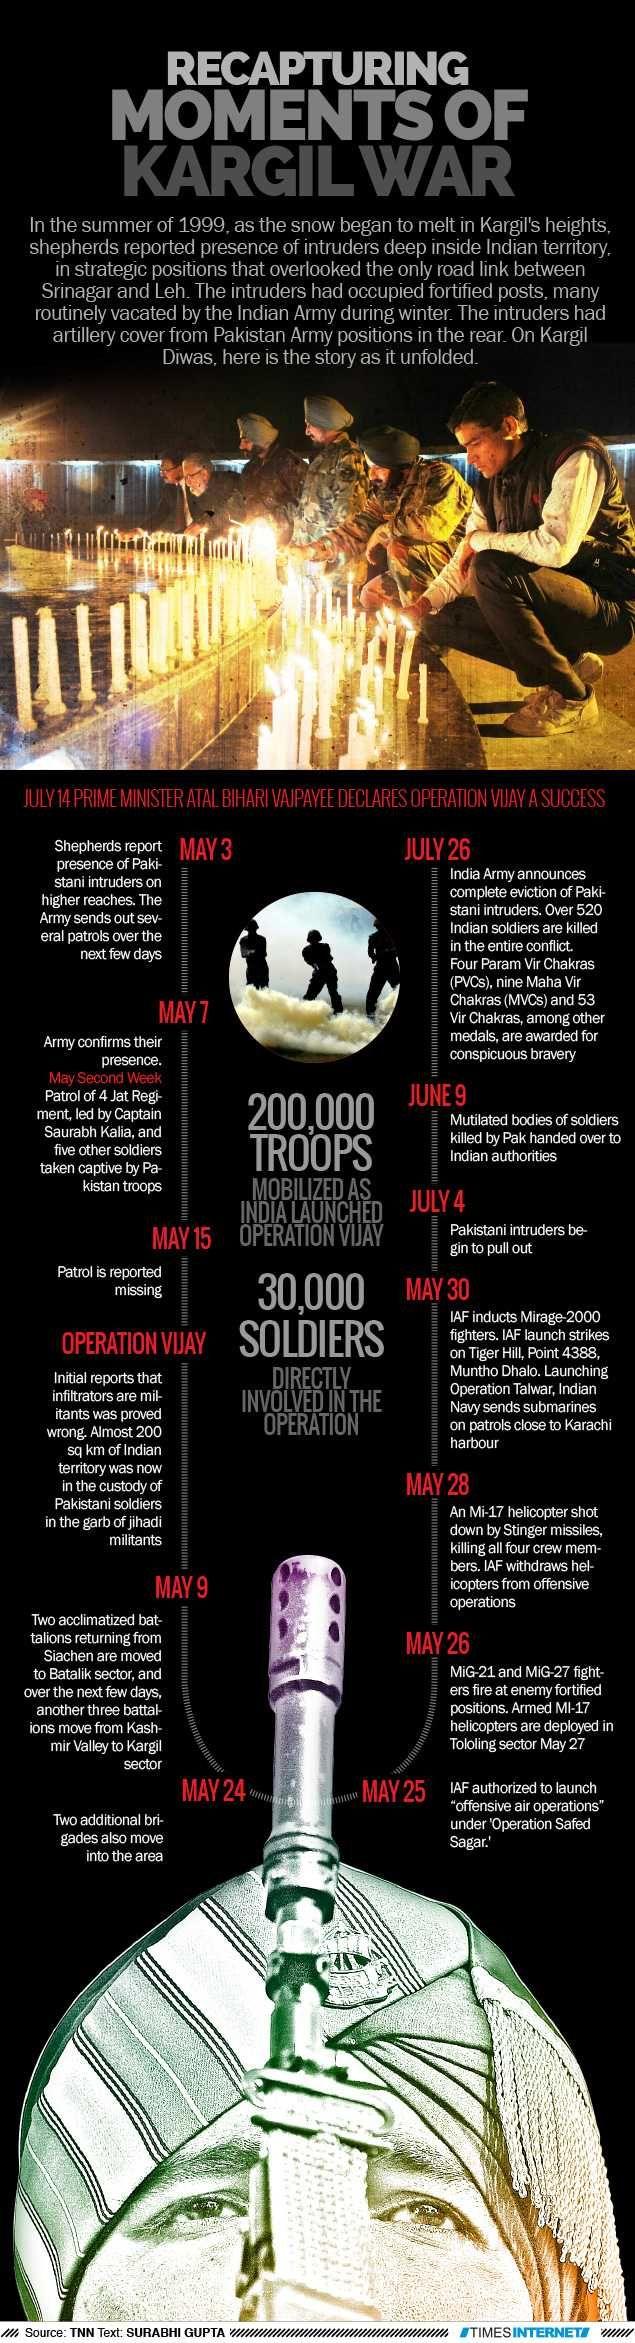 Recapturing moments of Kargil war | Times of India Mobile